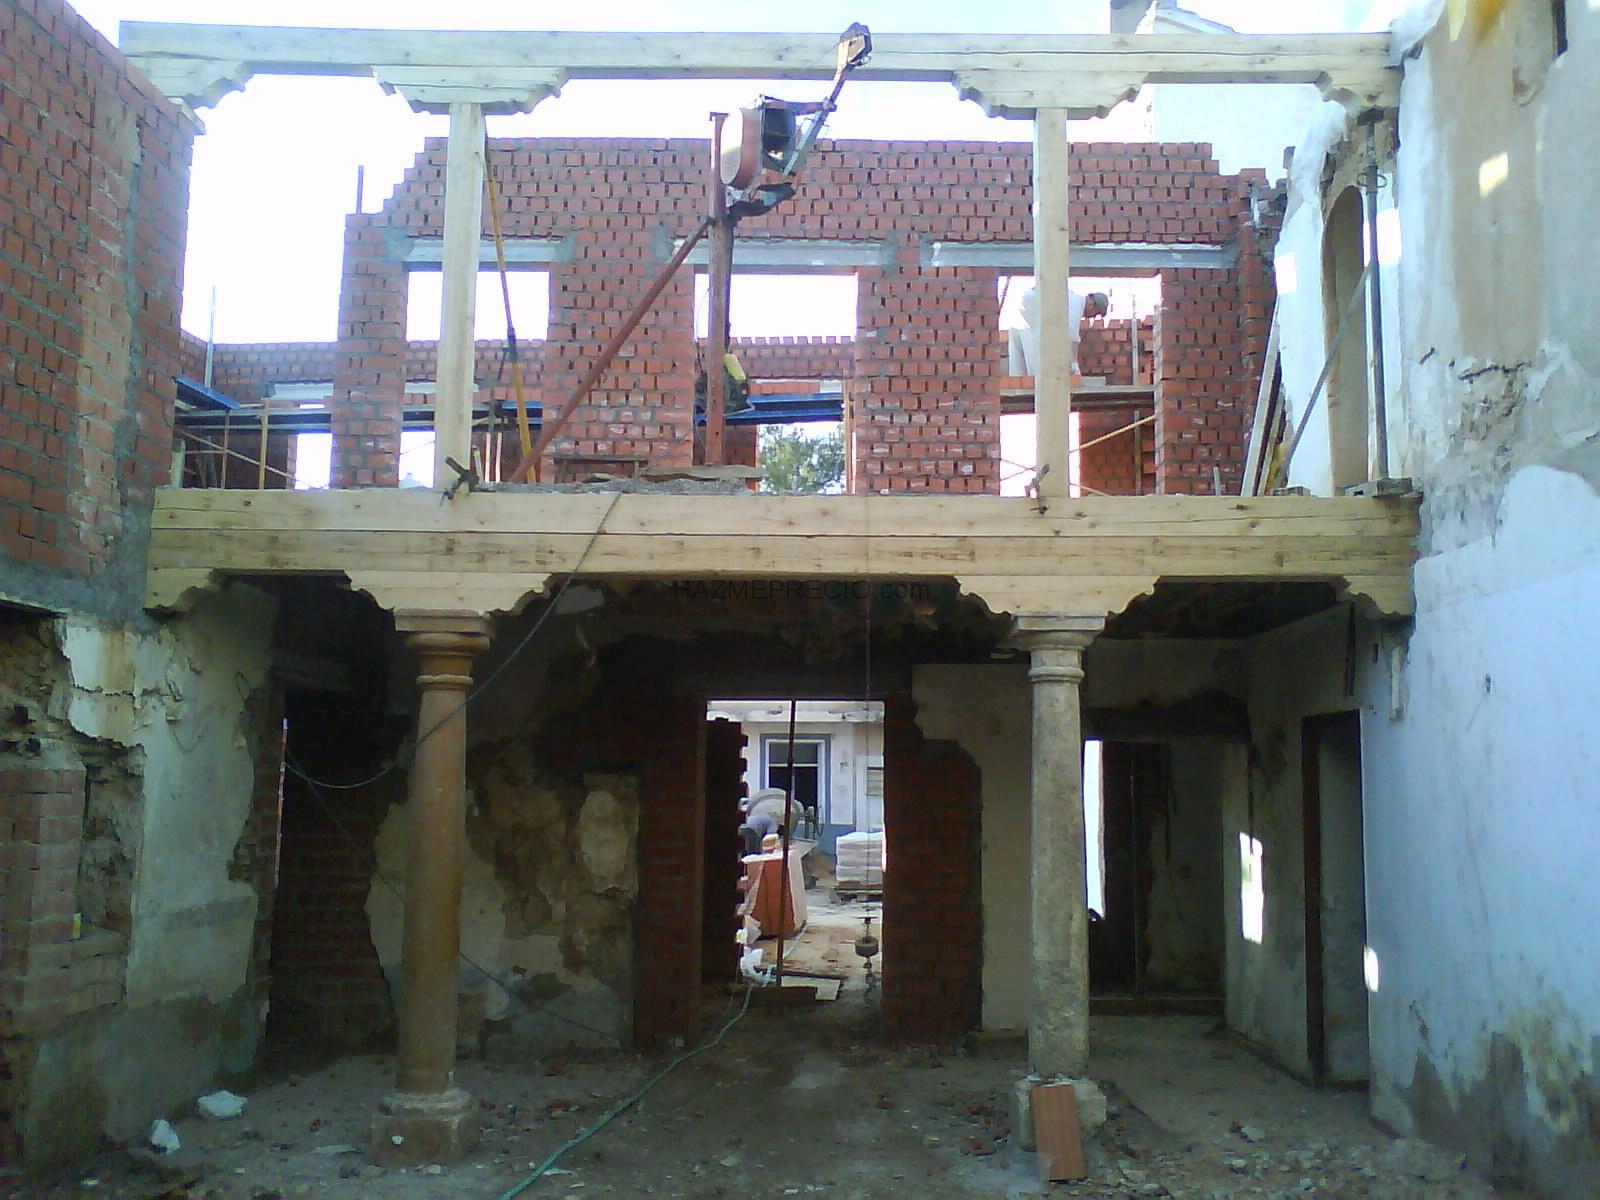 Rehabilitacion de viviendas madridejos - Rehabilitacion de casas antiguas ...